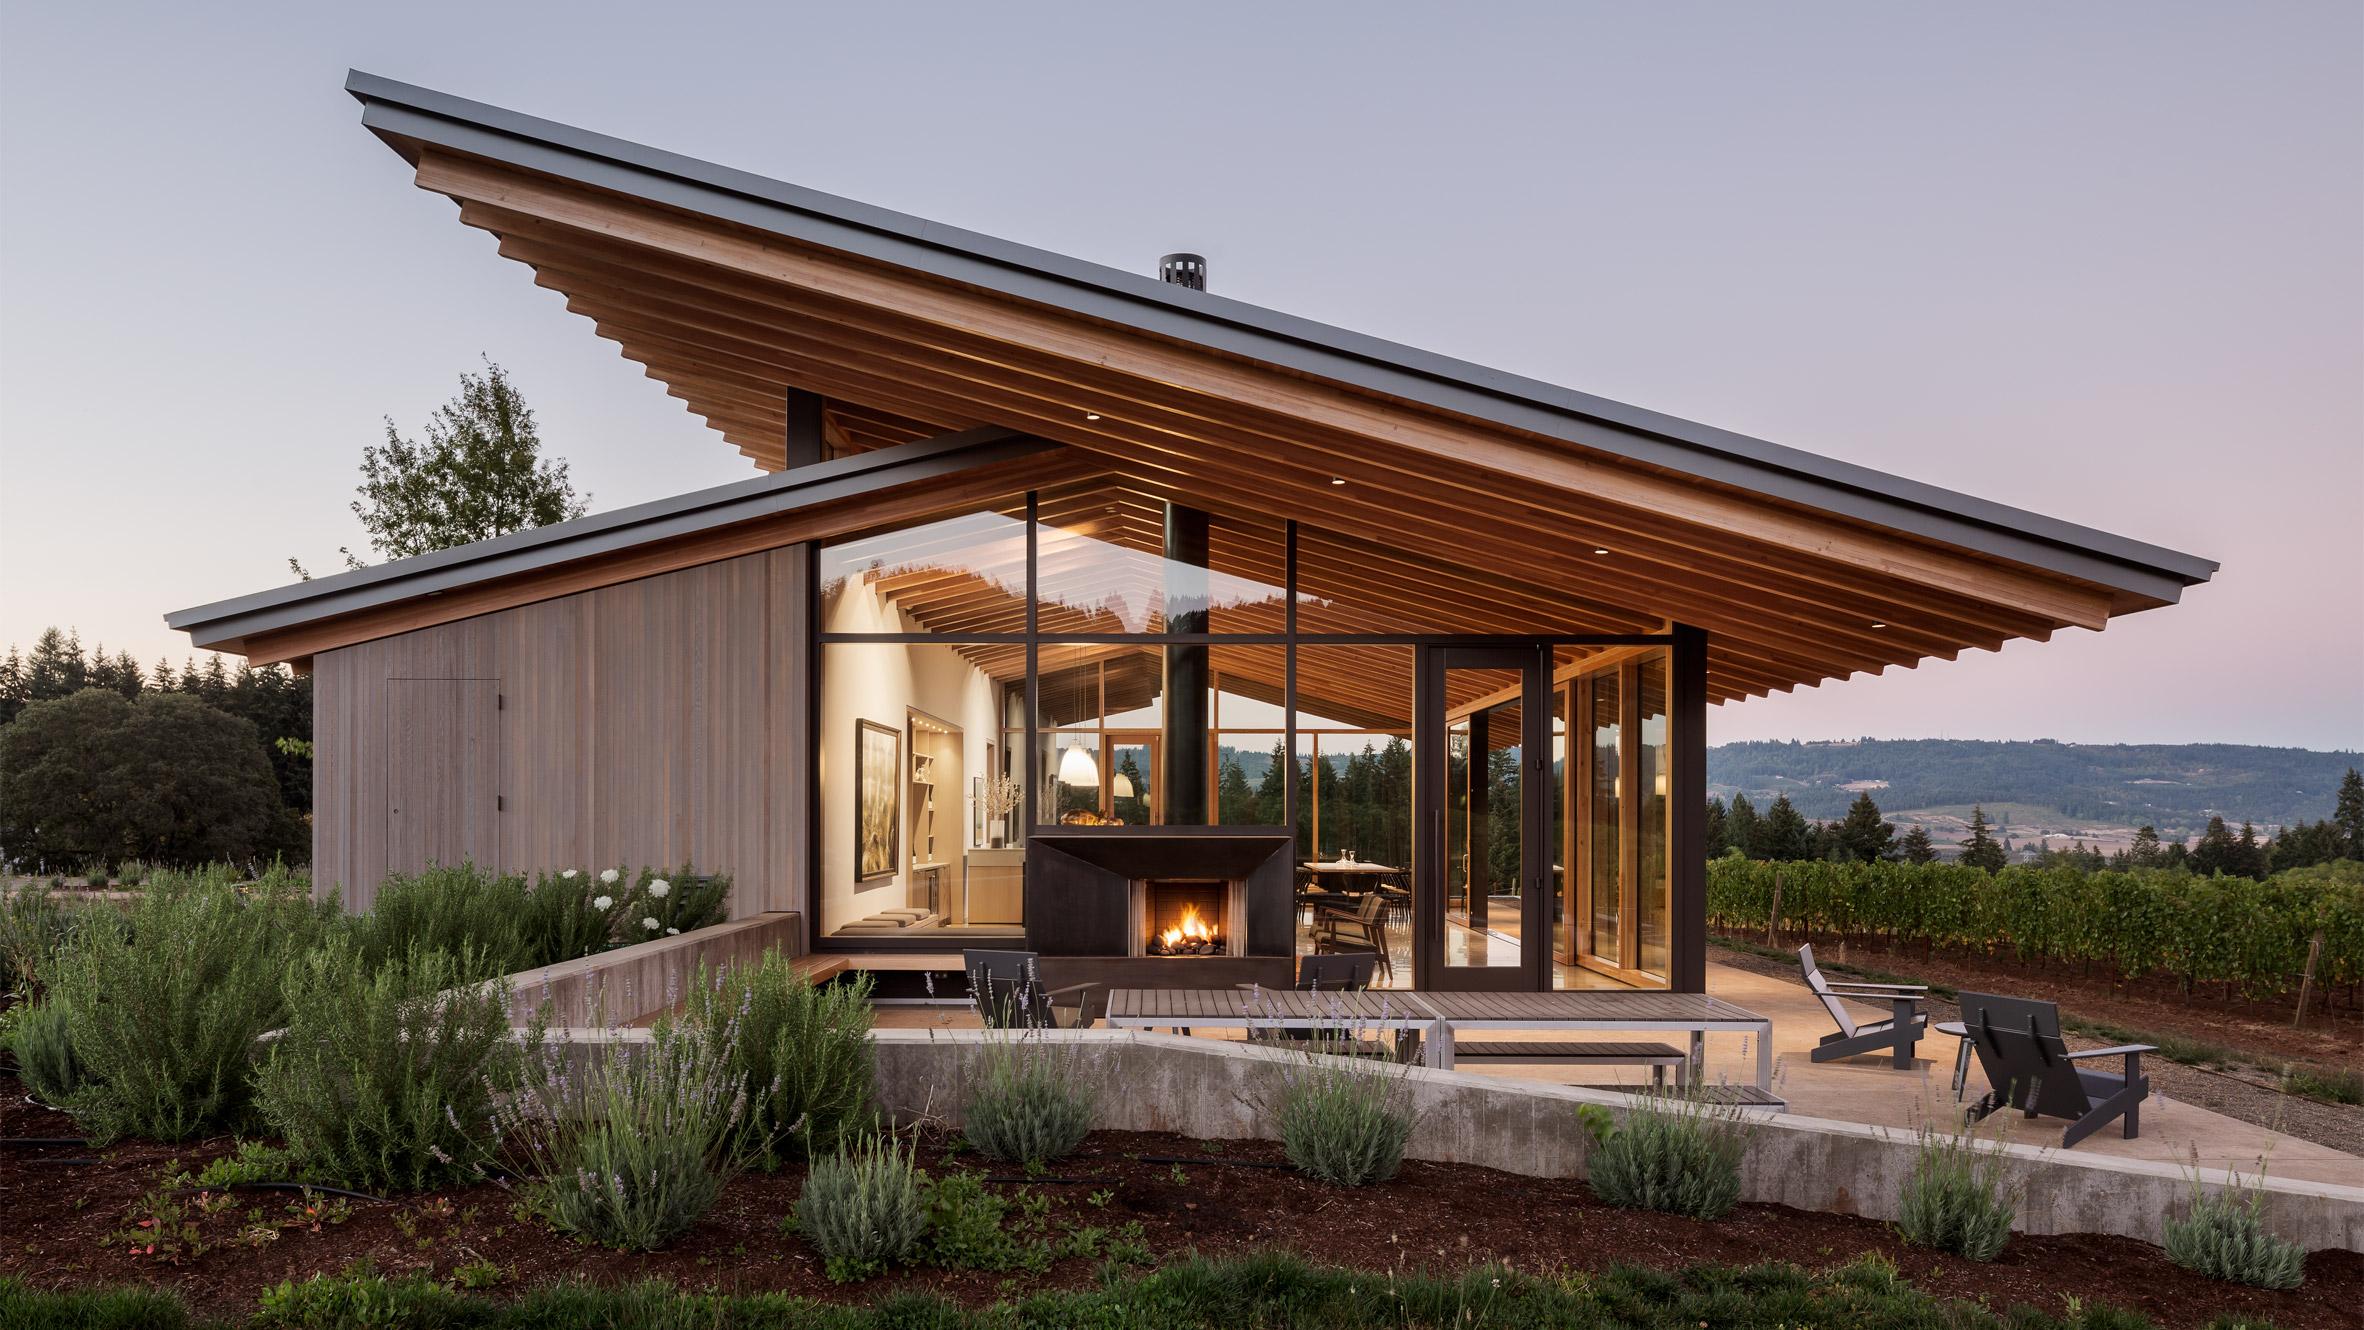 Lever Architecture designs Stunning Wine Tasting Room in Oregon